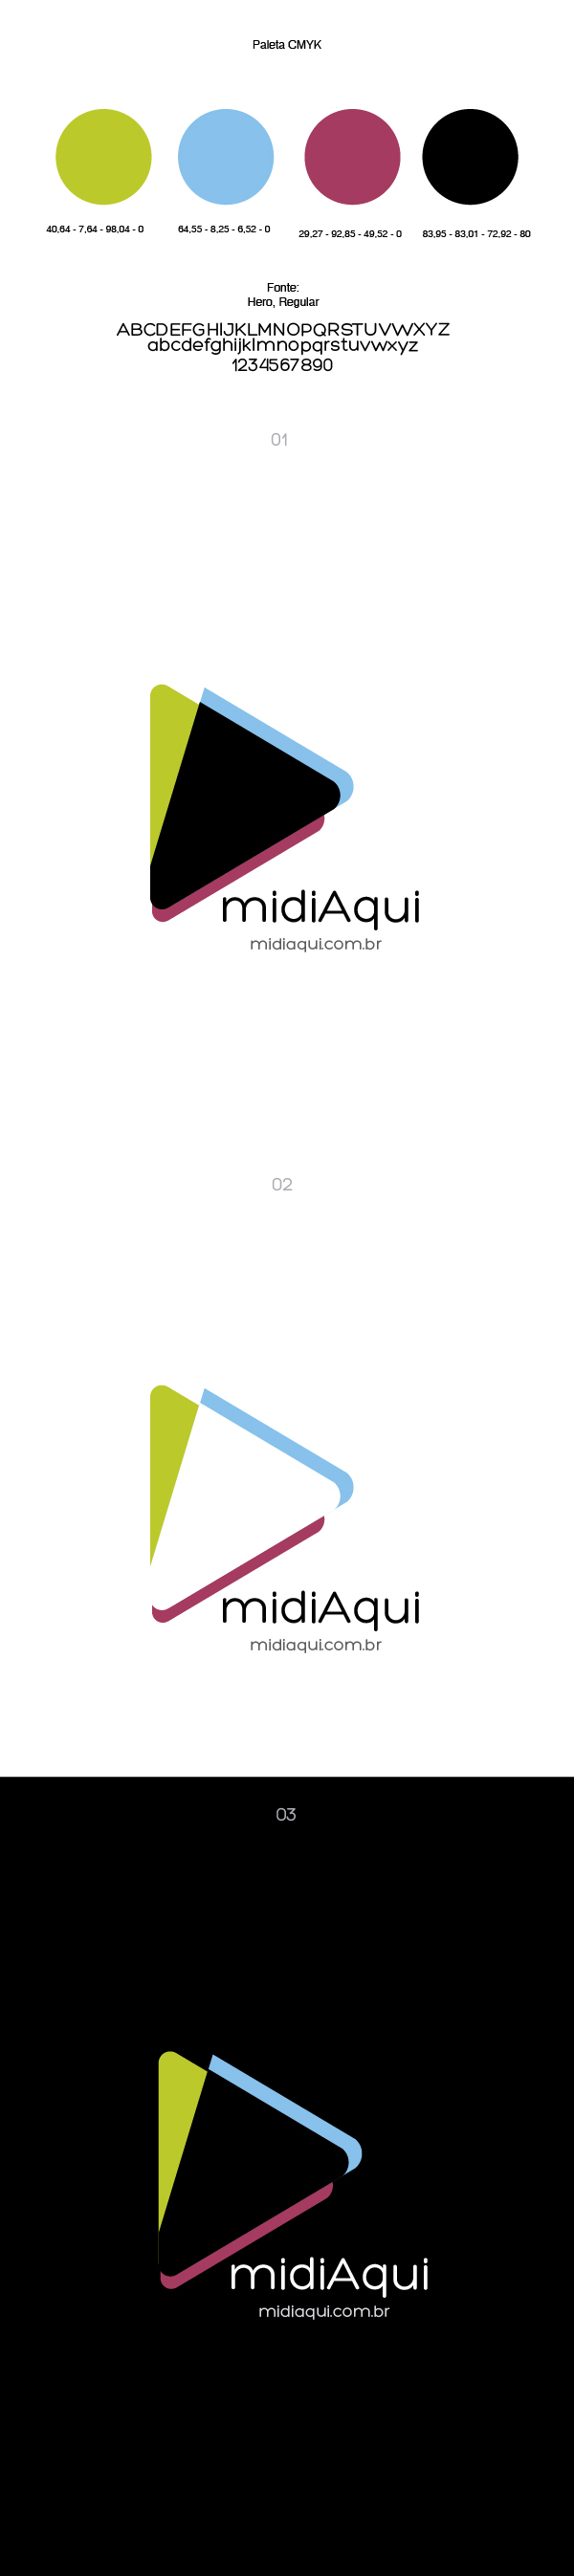 logo flat design brand